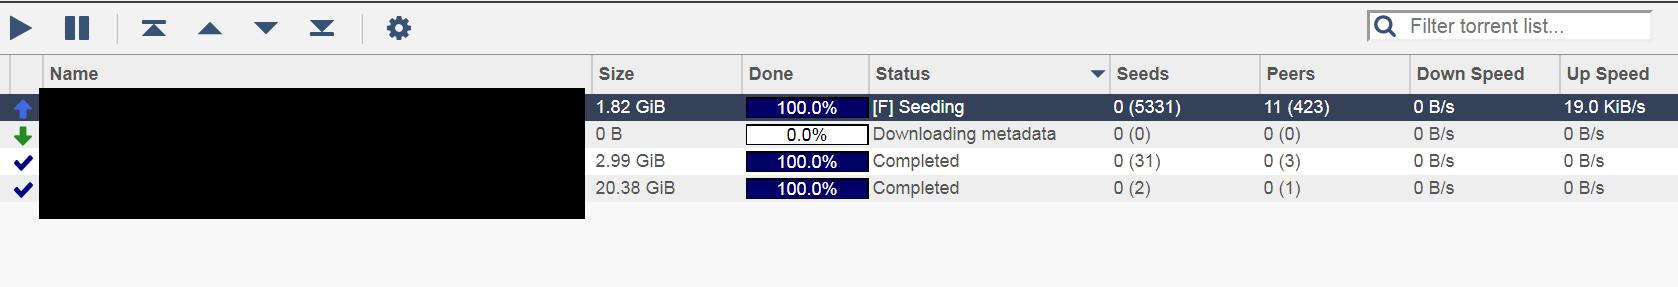 QBittorrent stuck at downloading metadata · Issue #45 · linuxserver